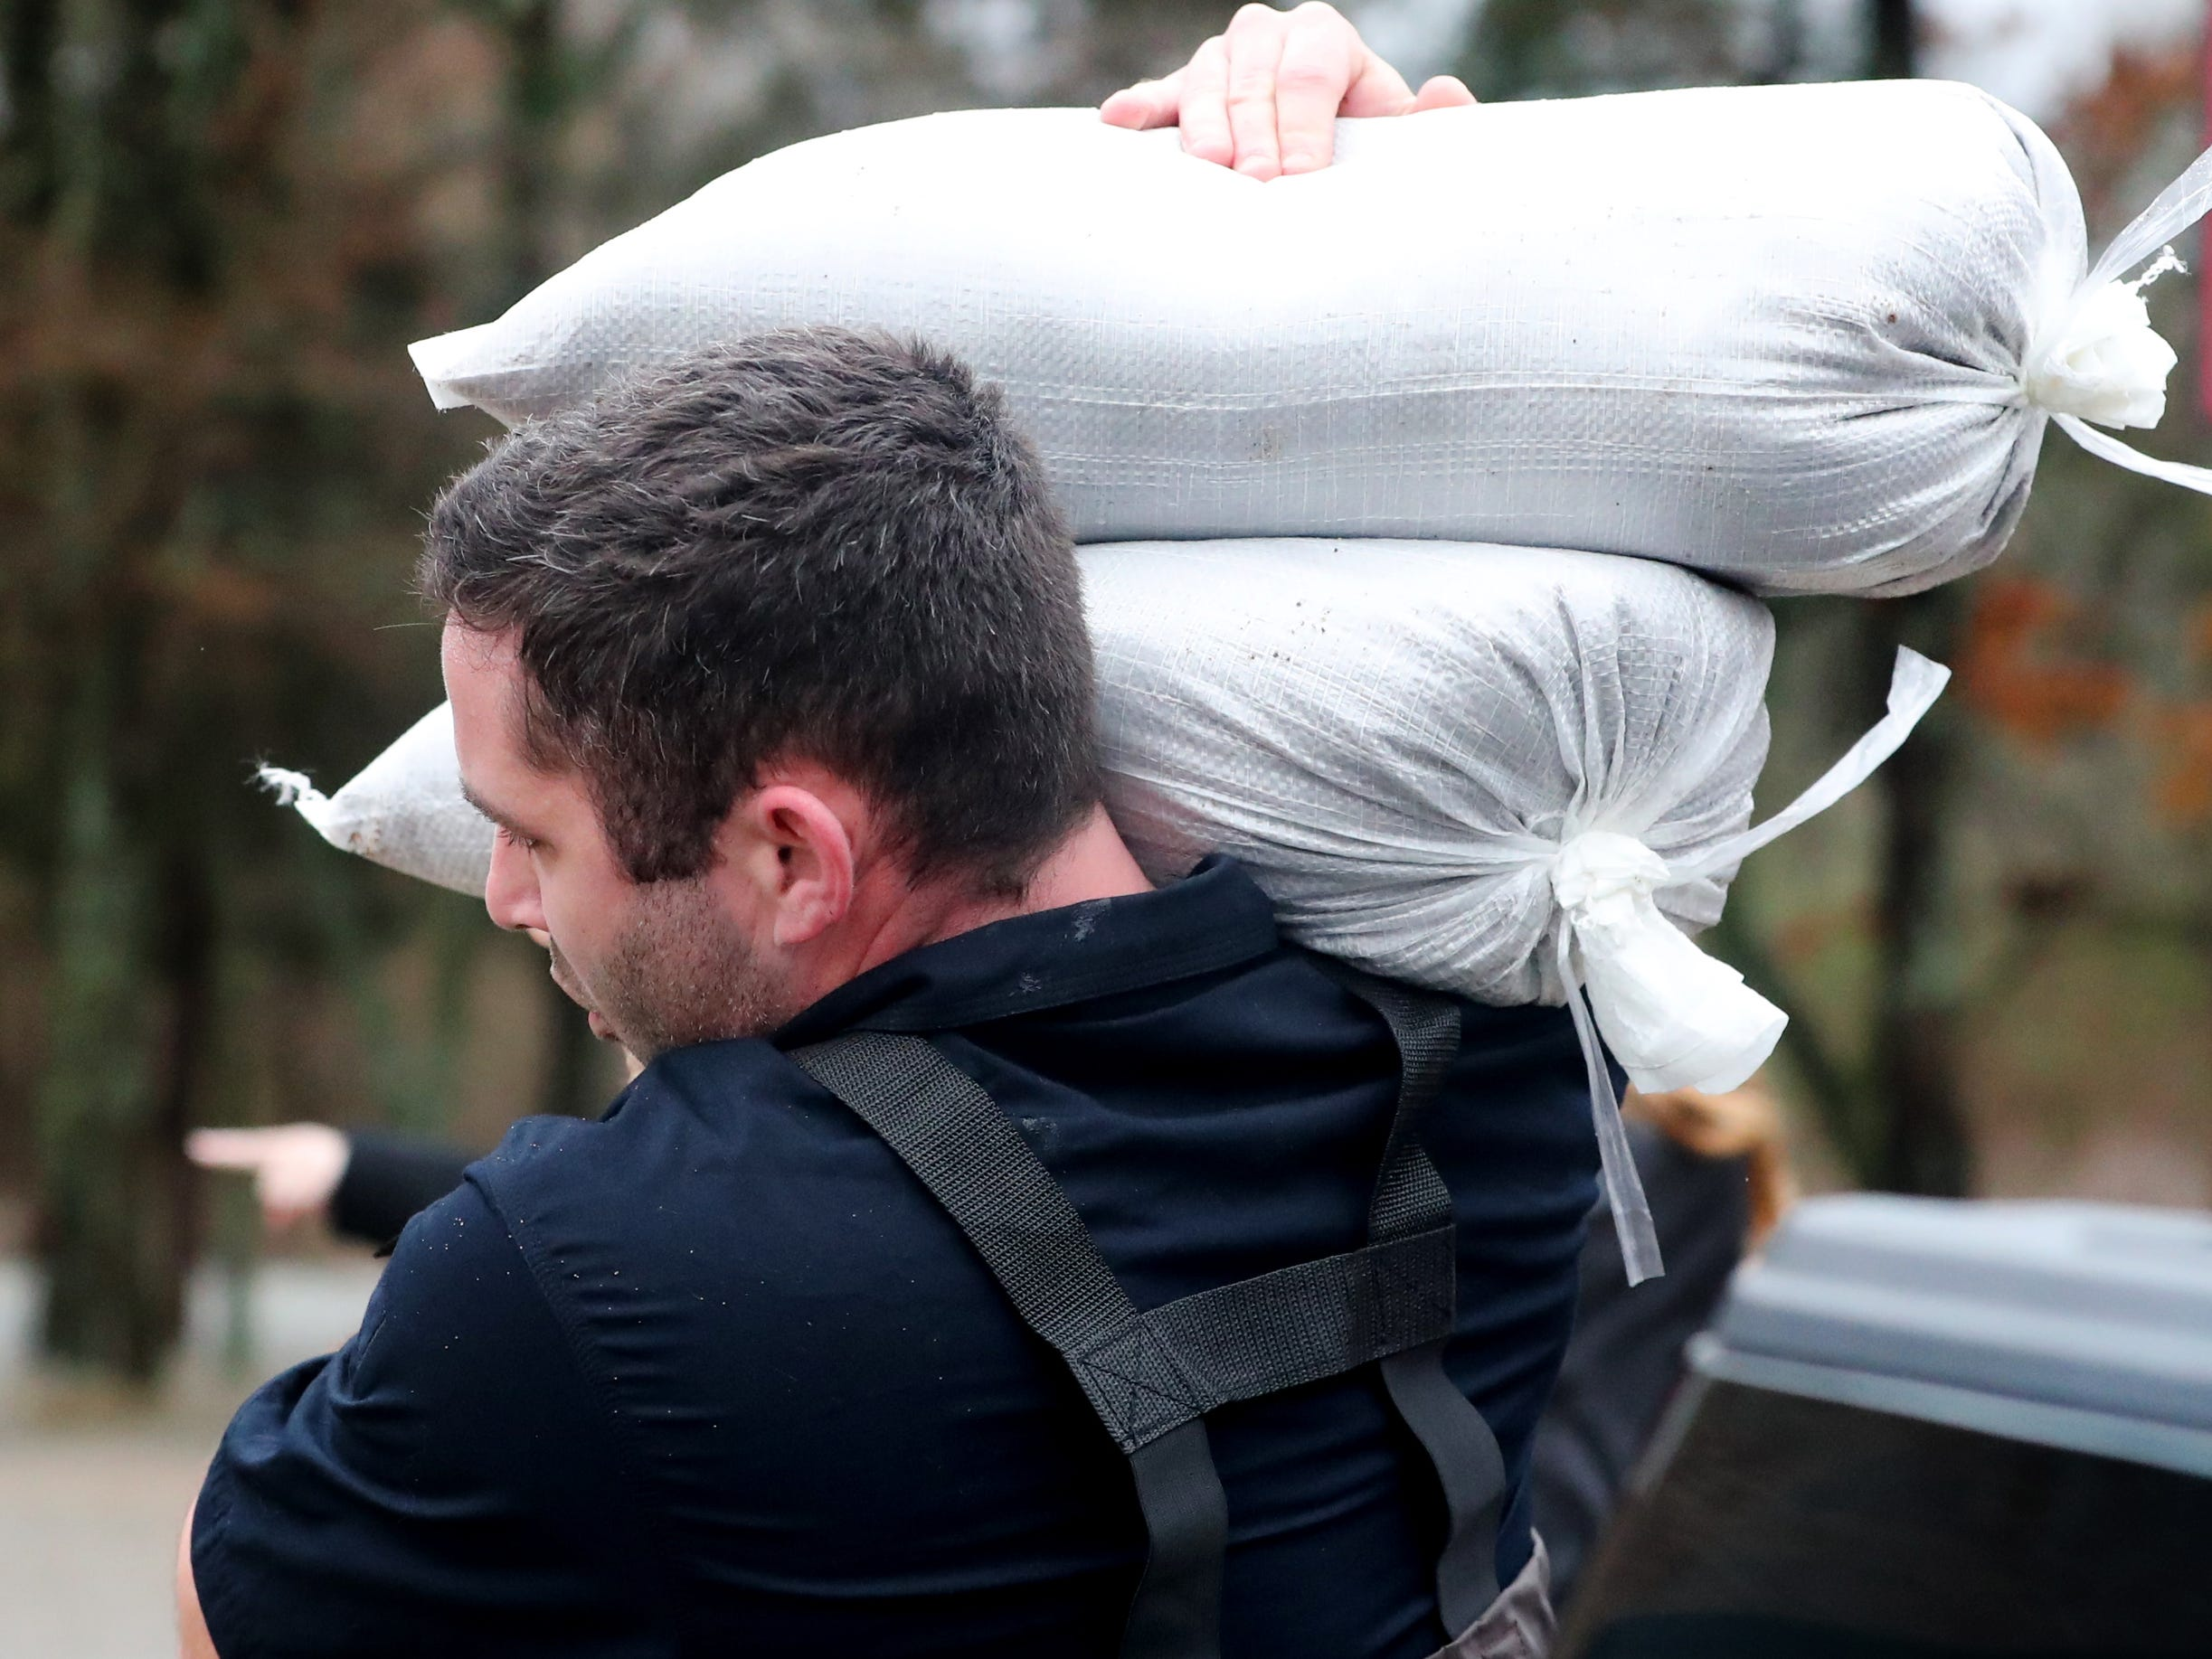 Christiana Fire Department members Allen Williams move  sand bags in Murfreesboro on Saturday, Feb. 23, 2019.